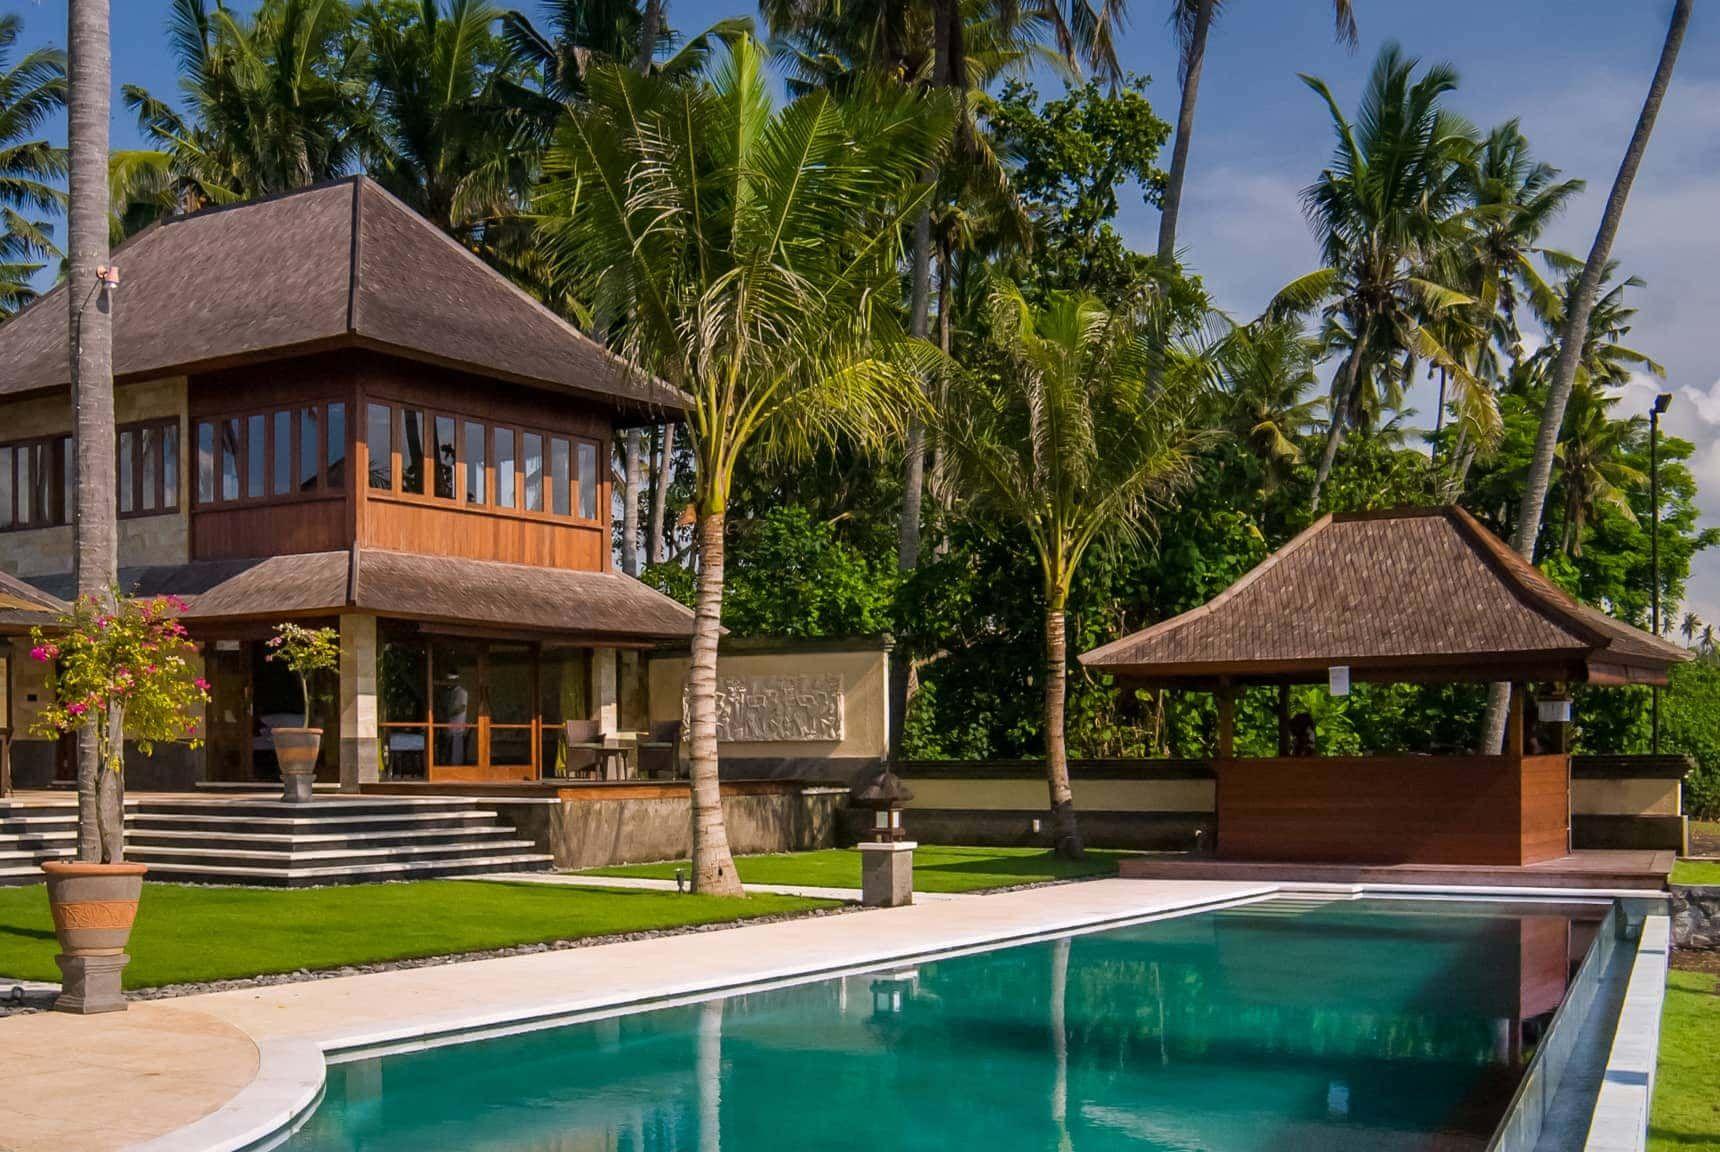 Villa Pushpapuri Ketewel Bali Indonesia Bali Villa Photography By Master Photographer Rick Carmichael Of Luxviz Bali Villa Luxury Villa